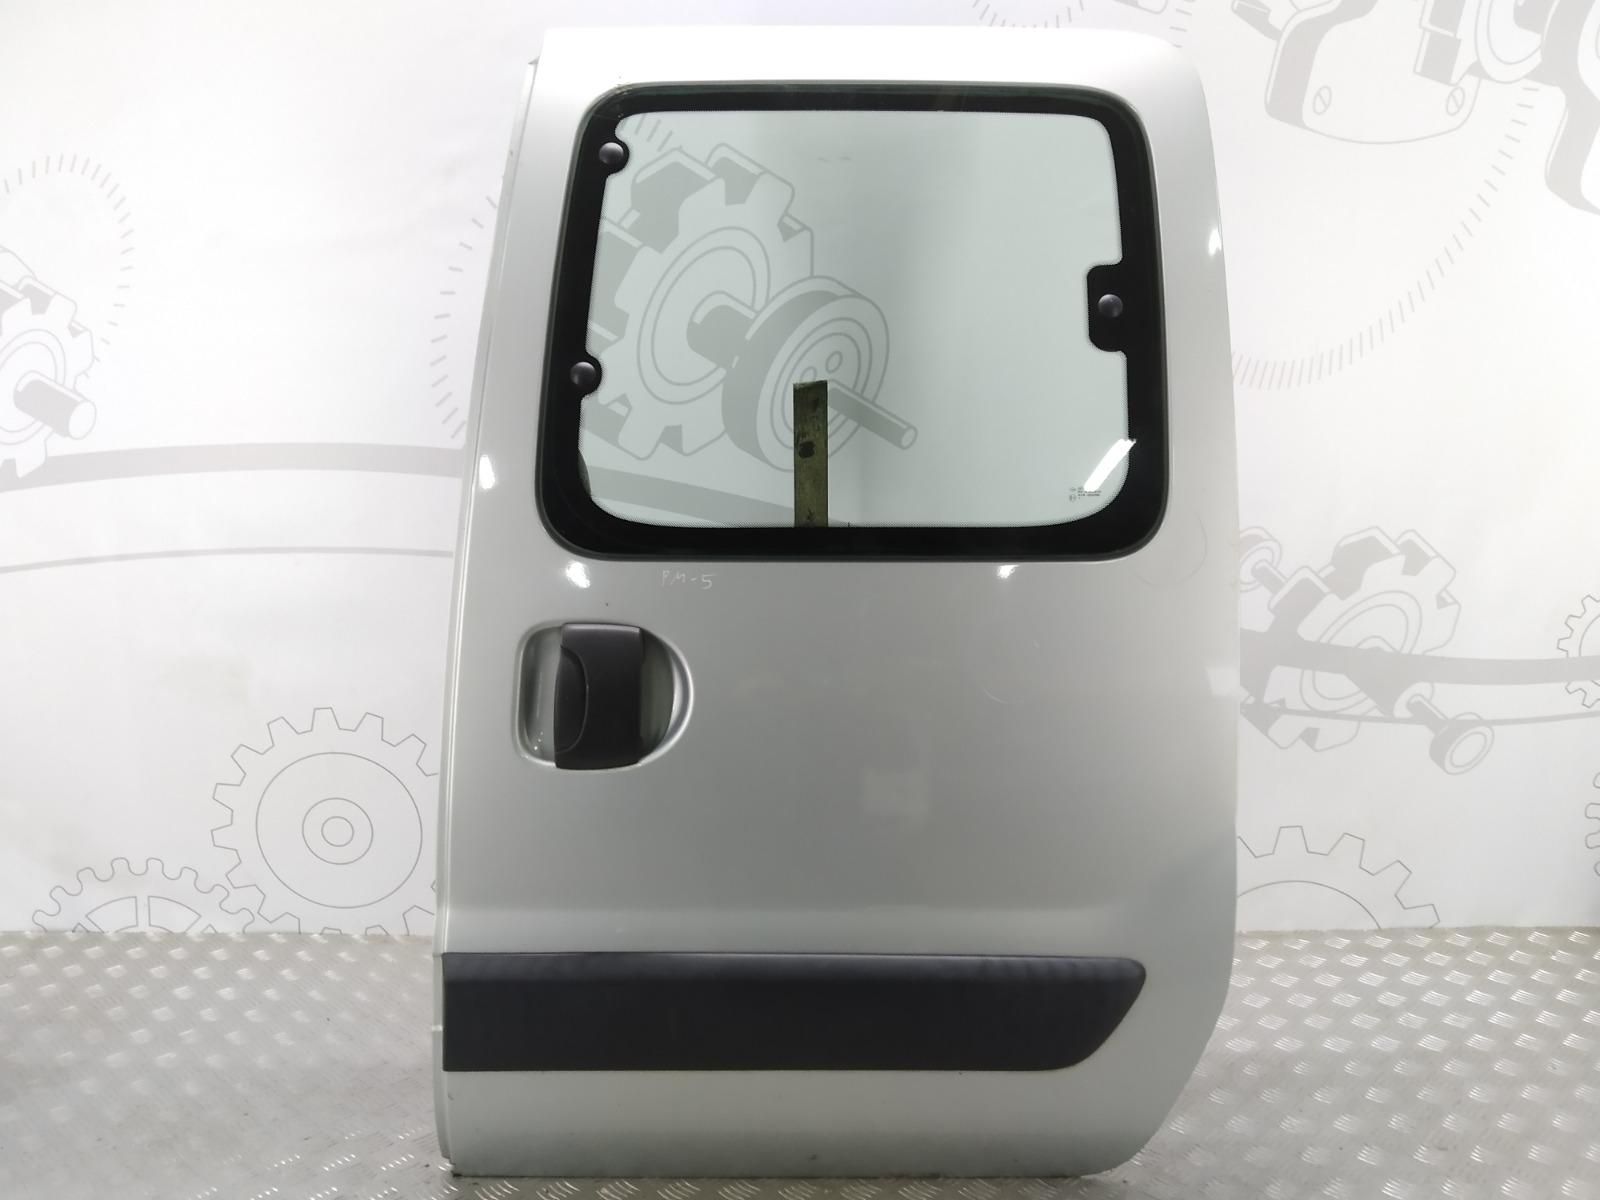 Дверь сдвижная левая Renault Kangoo 1.2 I 2007 (б/у)